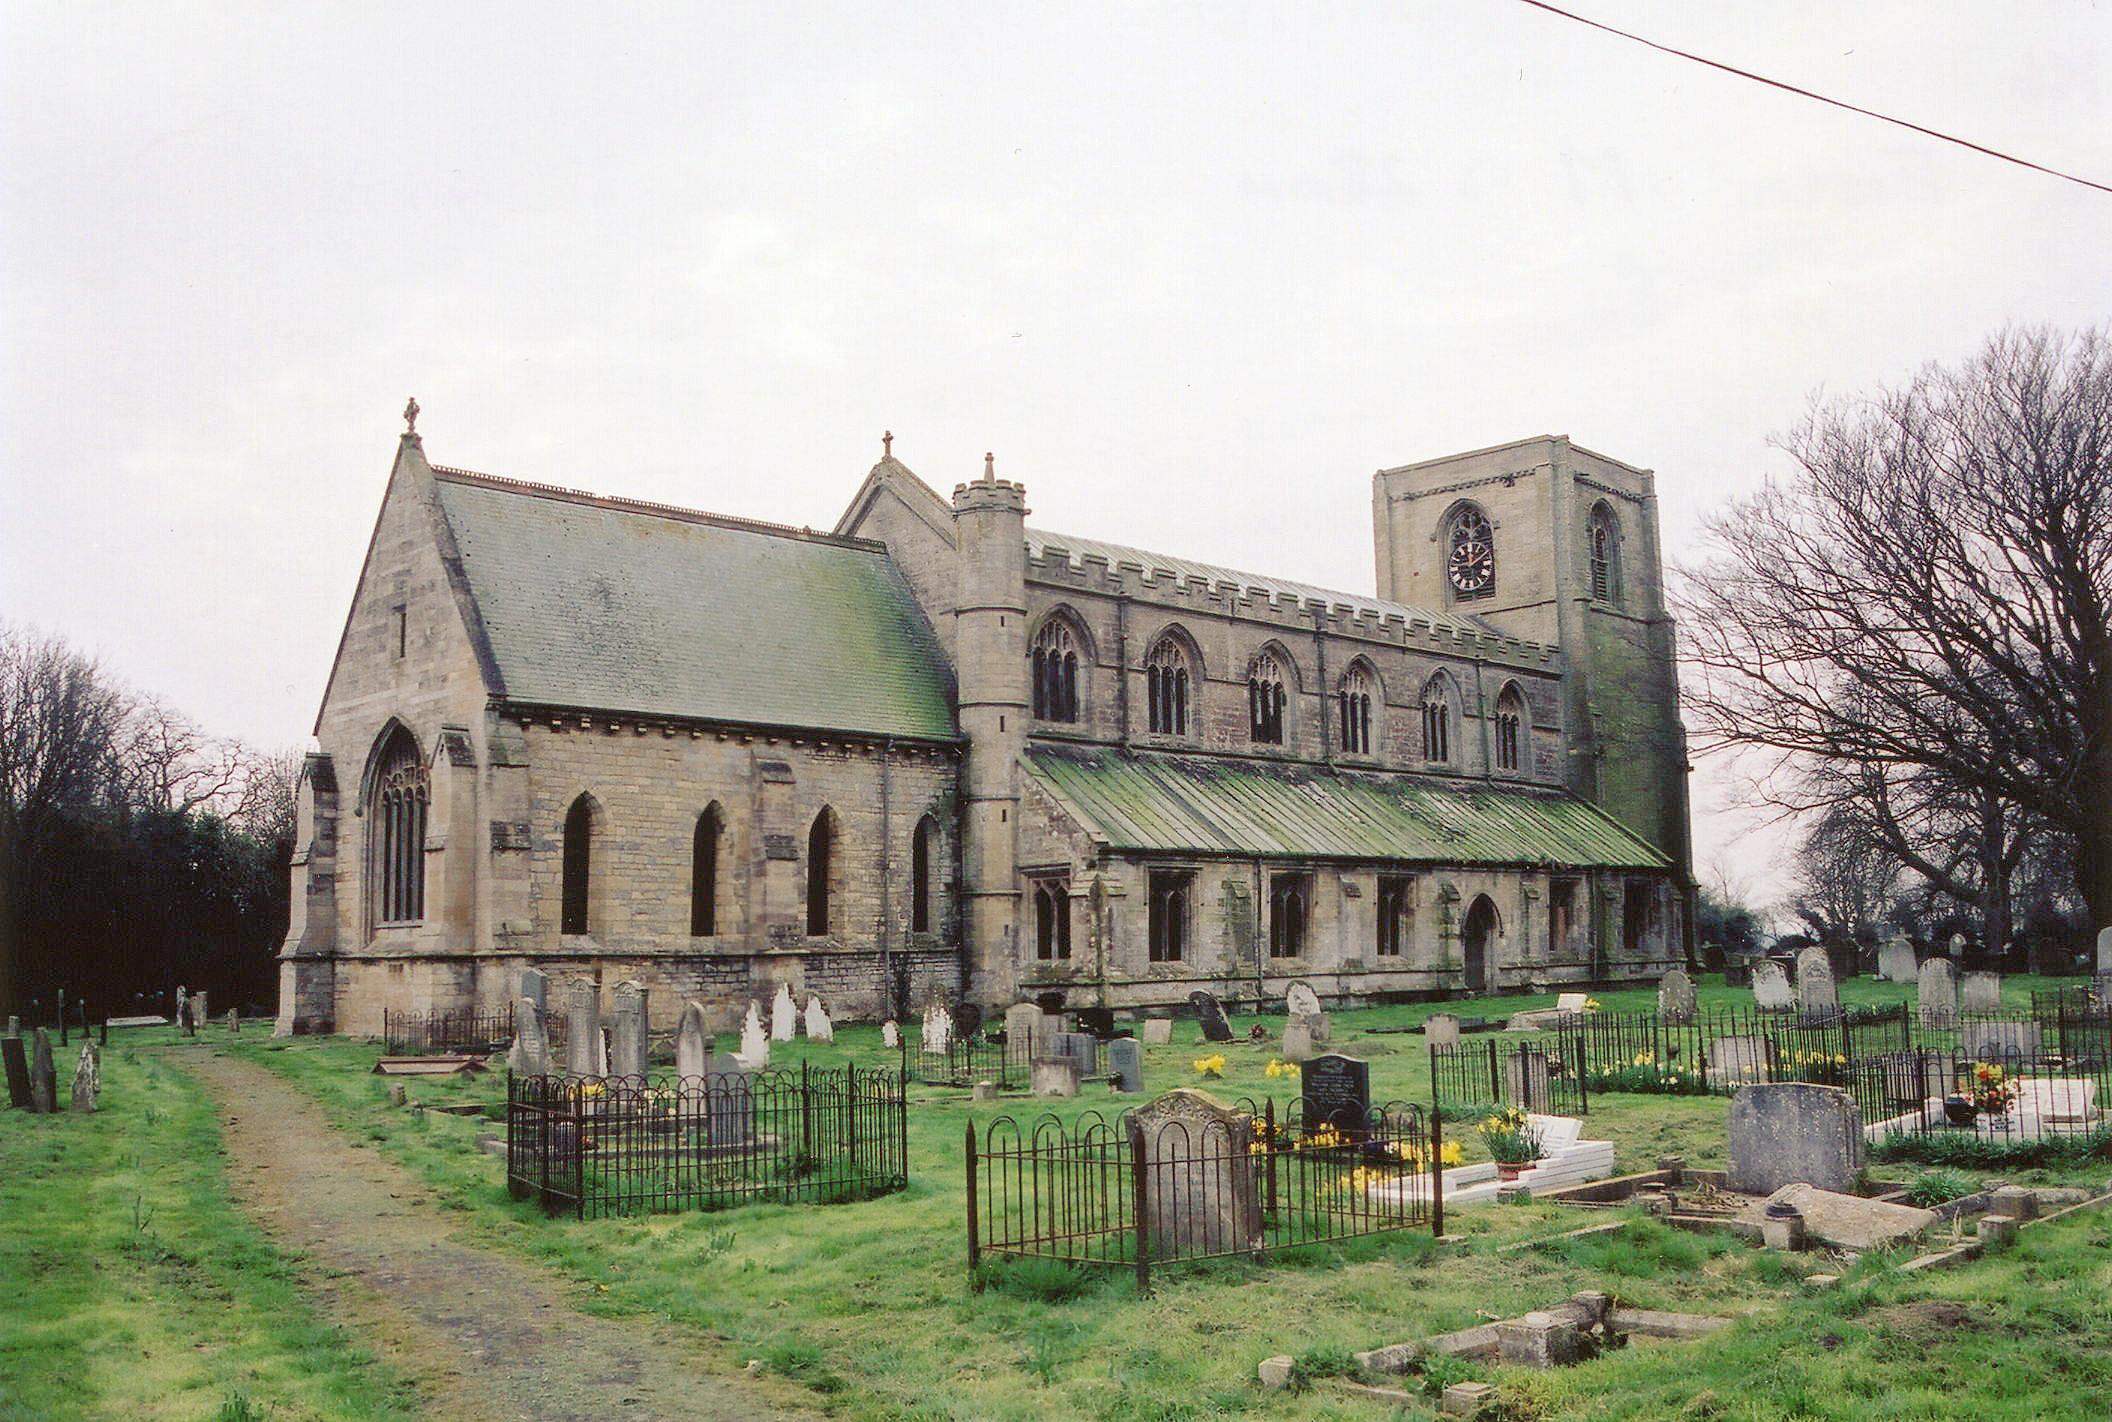 Benington All Saints church